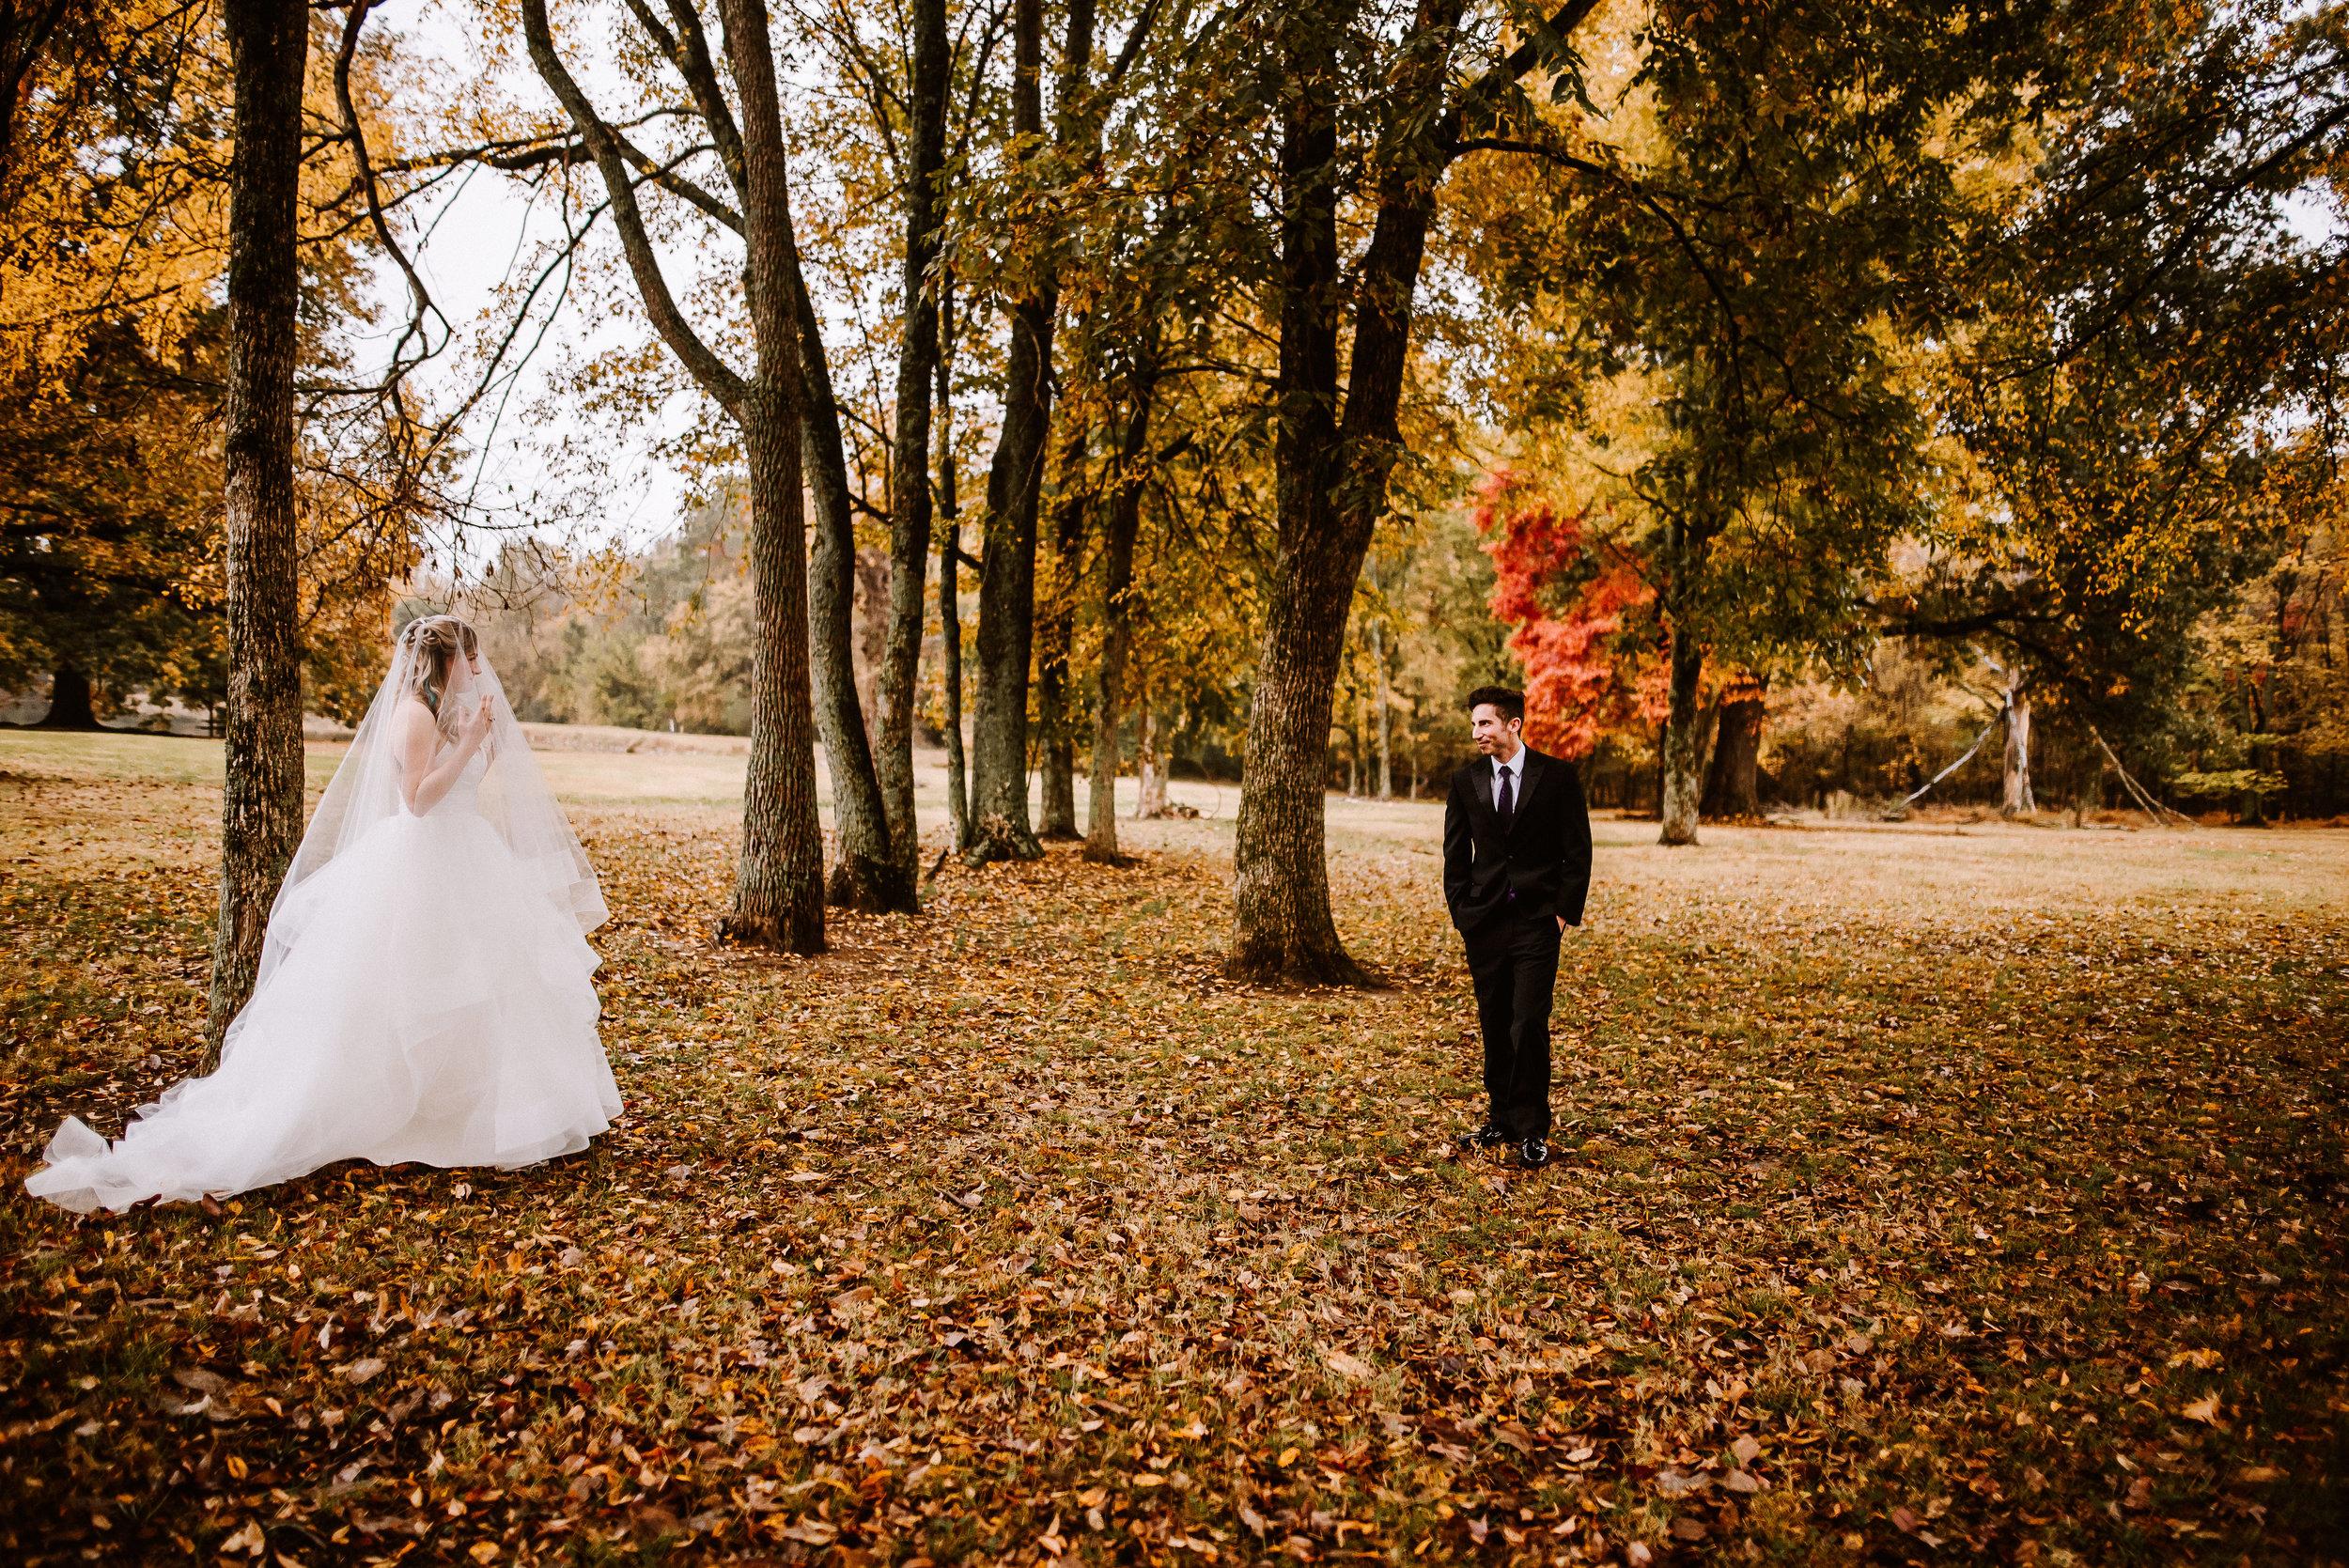 Lucchesi-Wedding_Shelby-Farms_Ashley-Benham-Photography-120.jpg